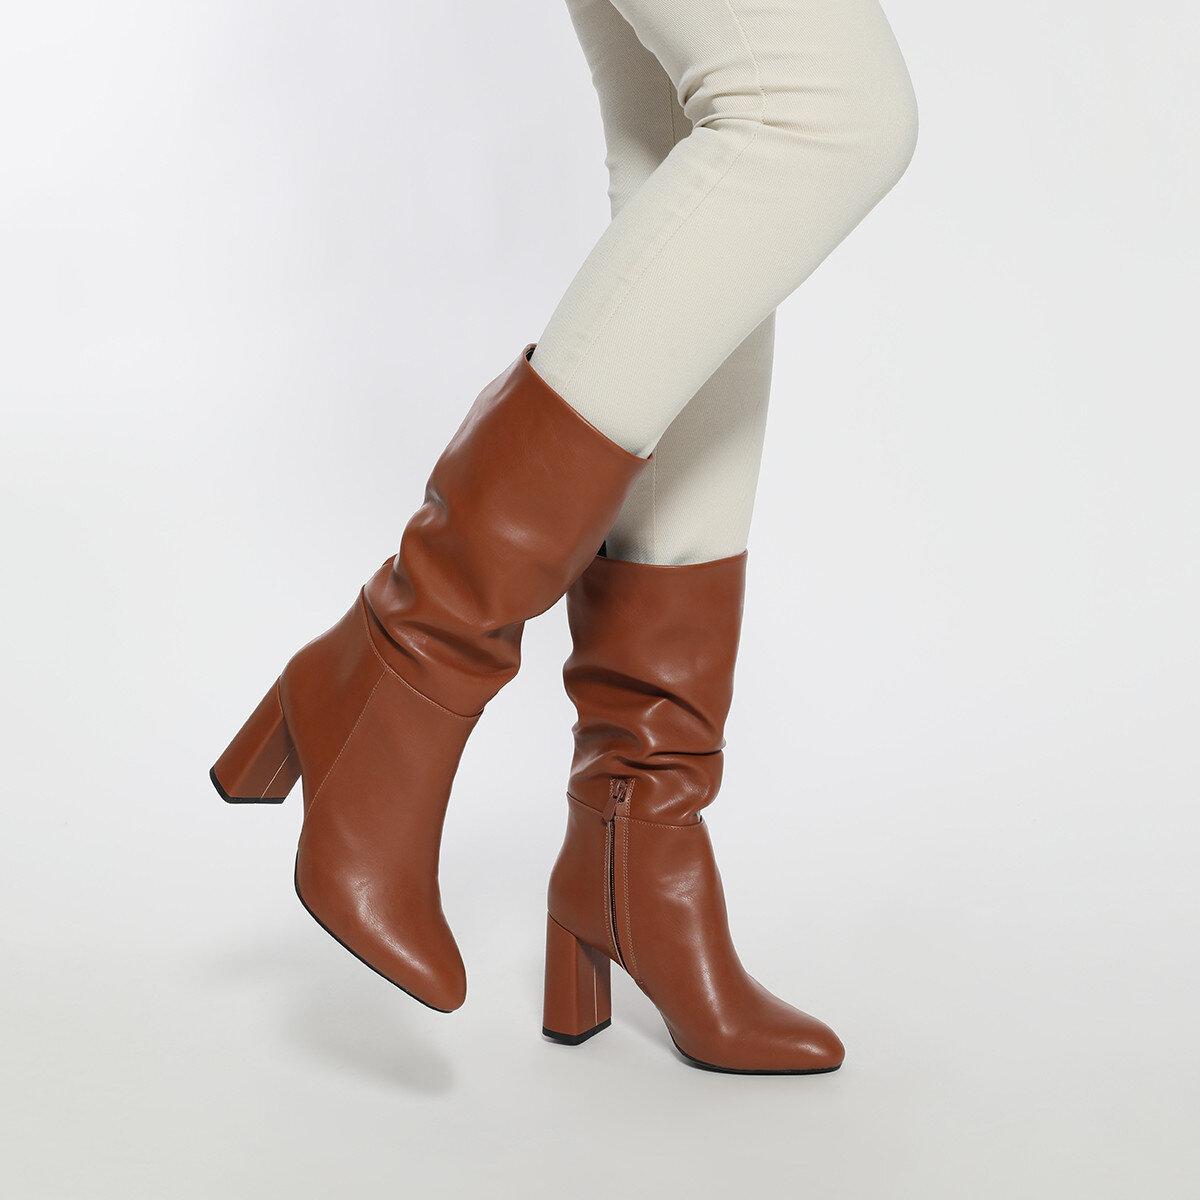 UMBRIA Taba Kadın Topuklu Çizme